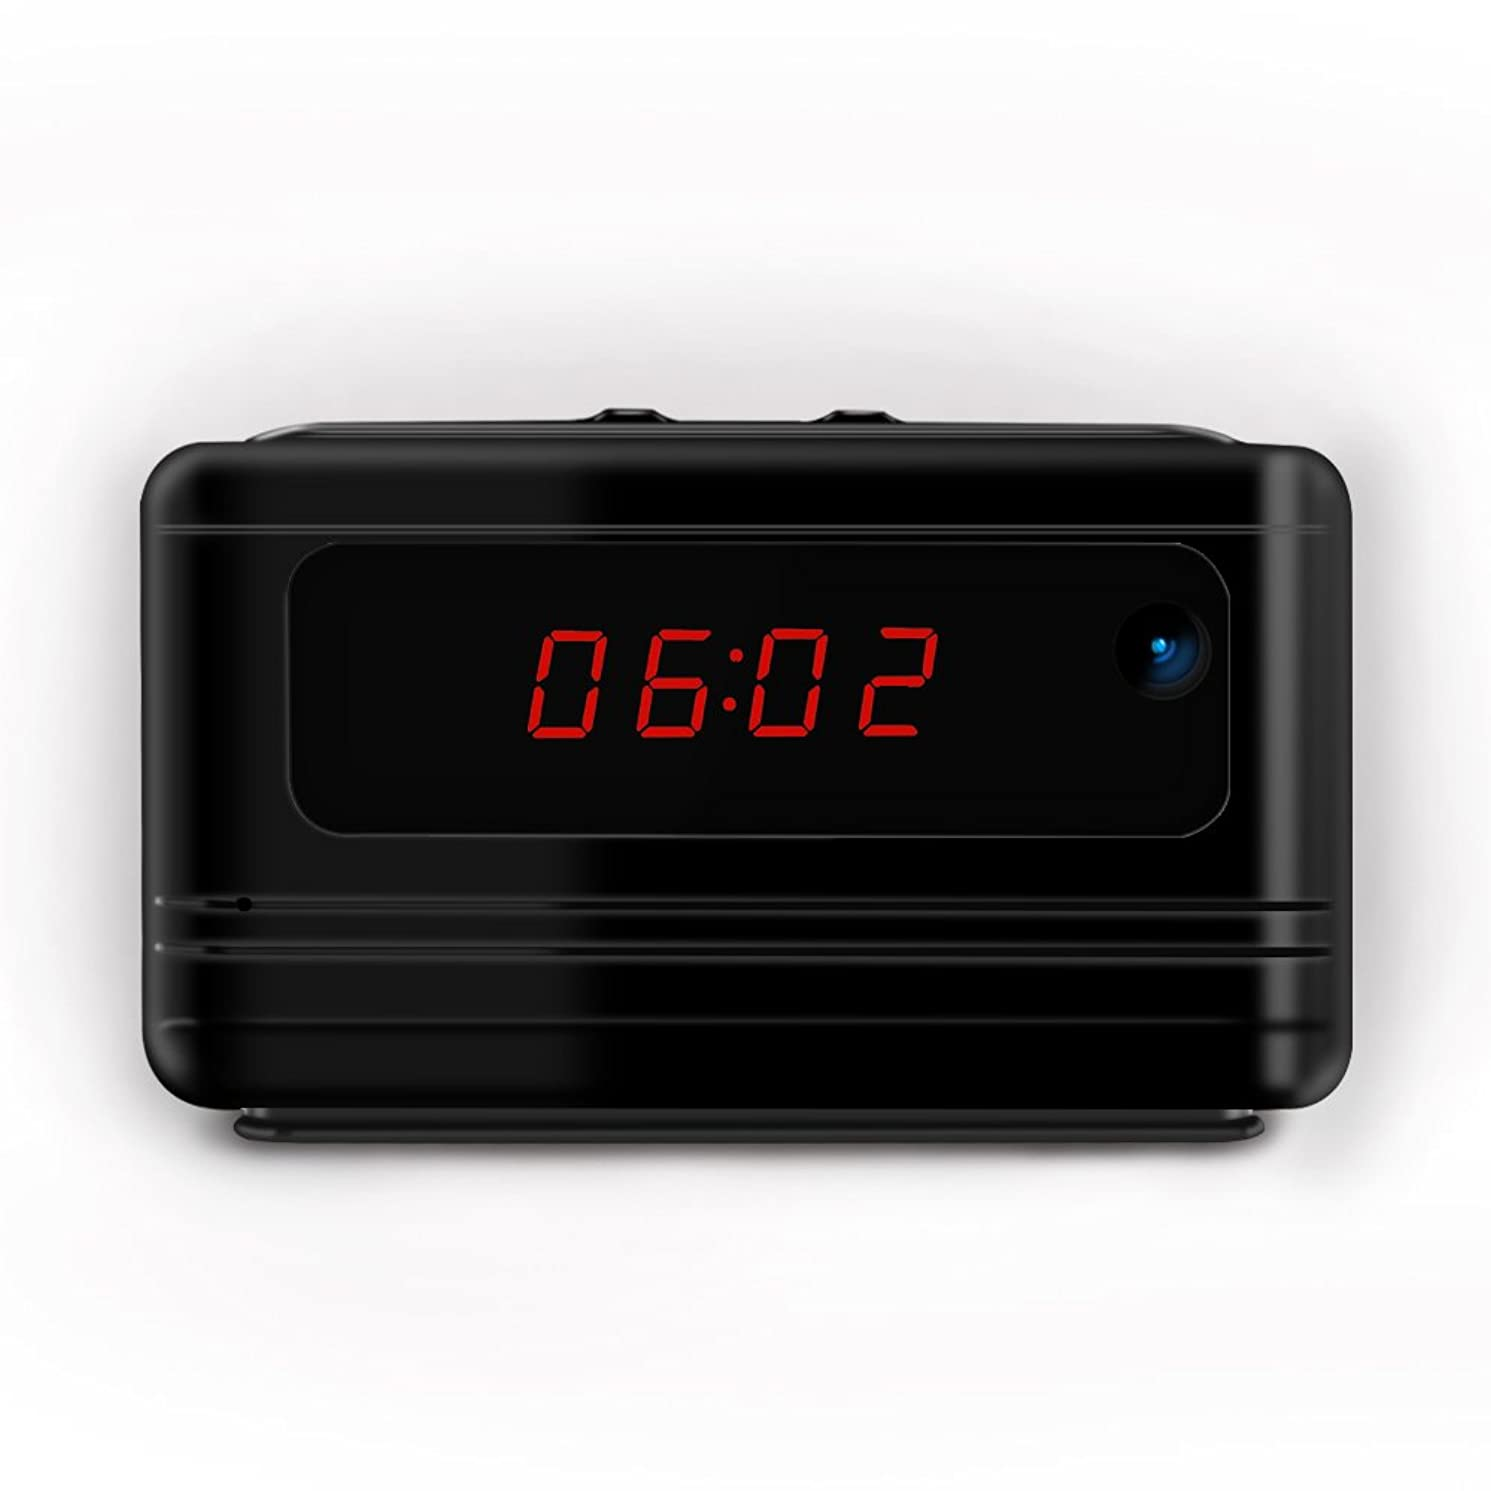 Mini Spy Hidden Camera Clock, Loop Video Recorder Security Camera Supports Motion Detection, Nanny Cam